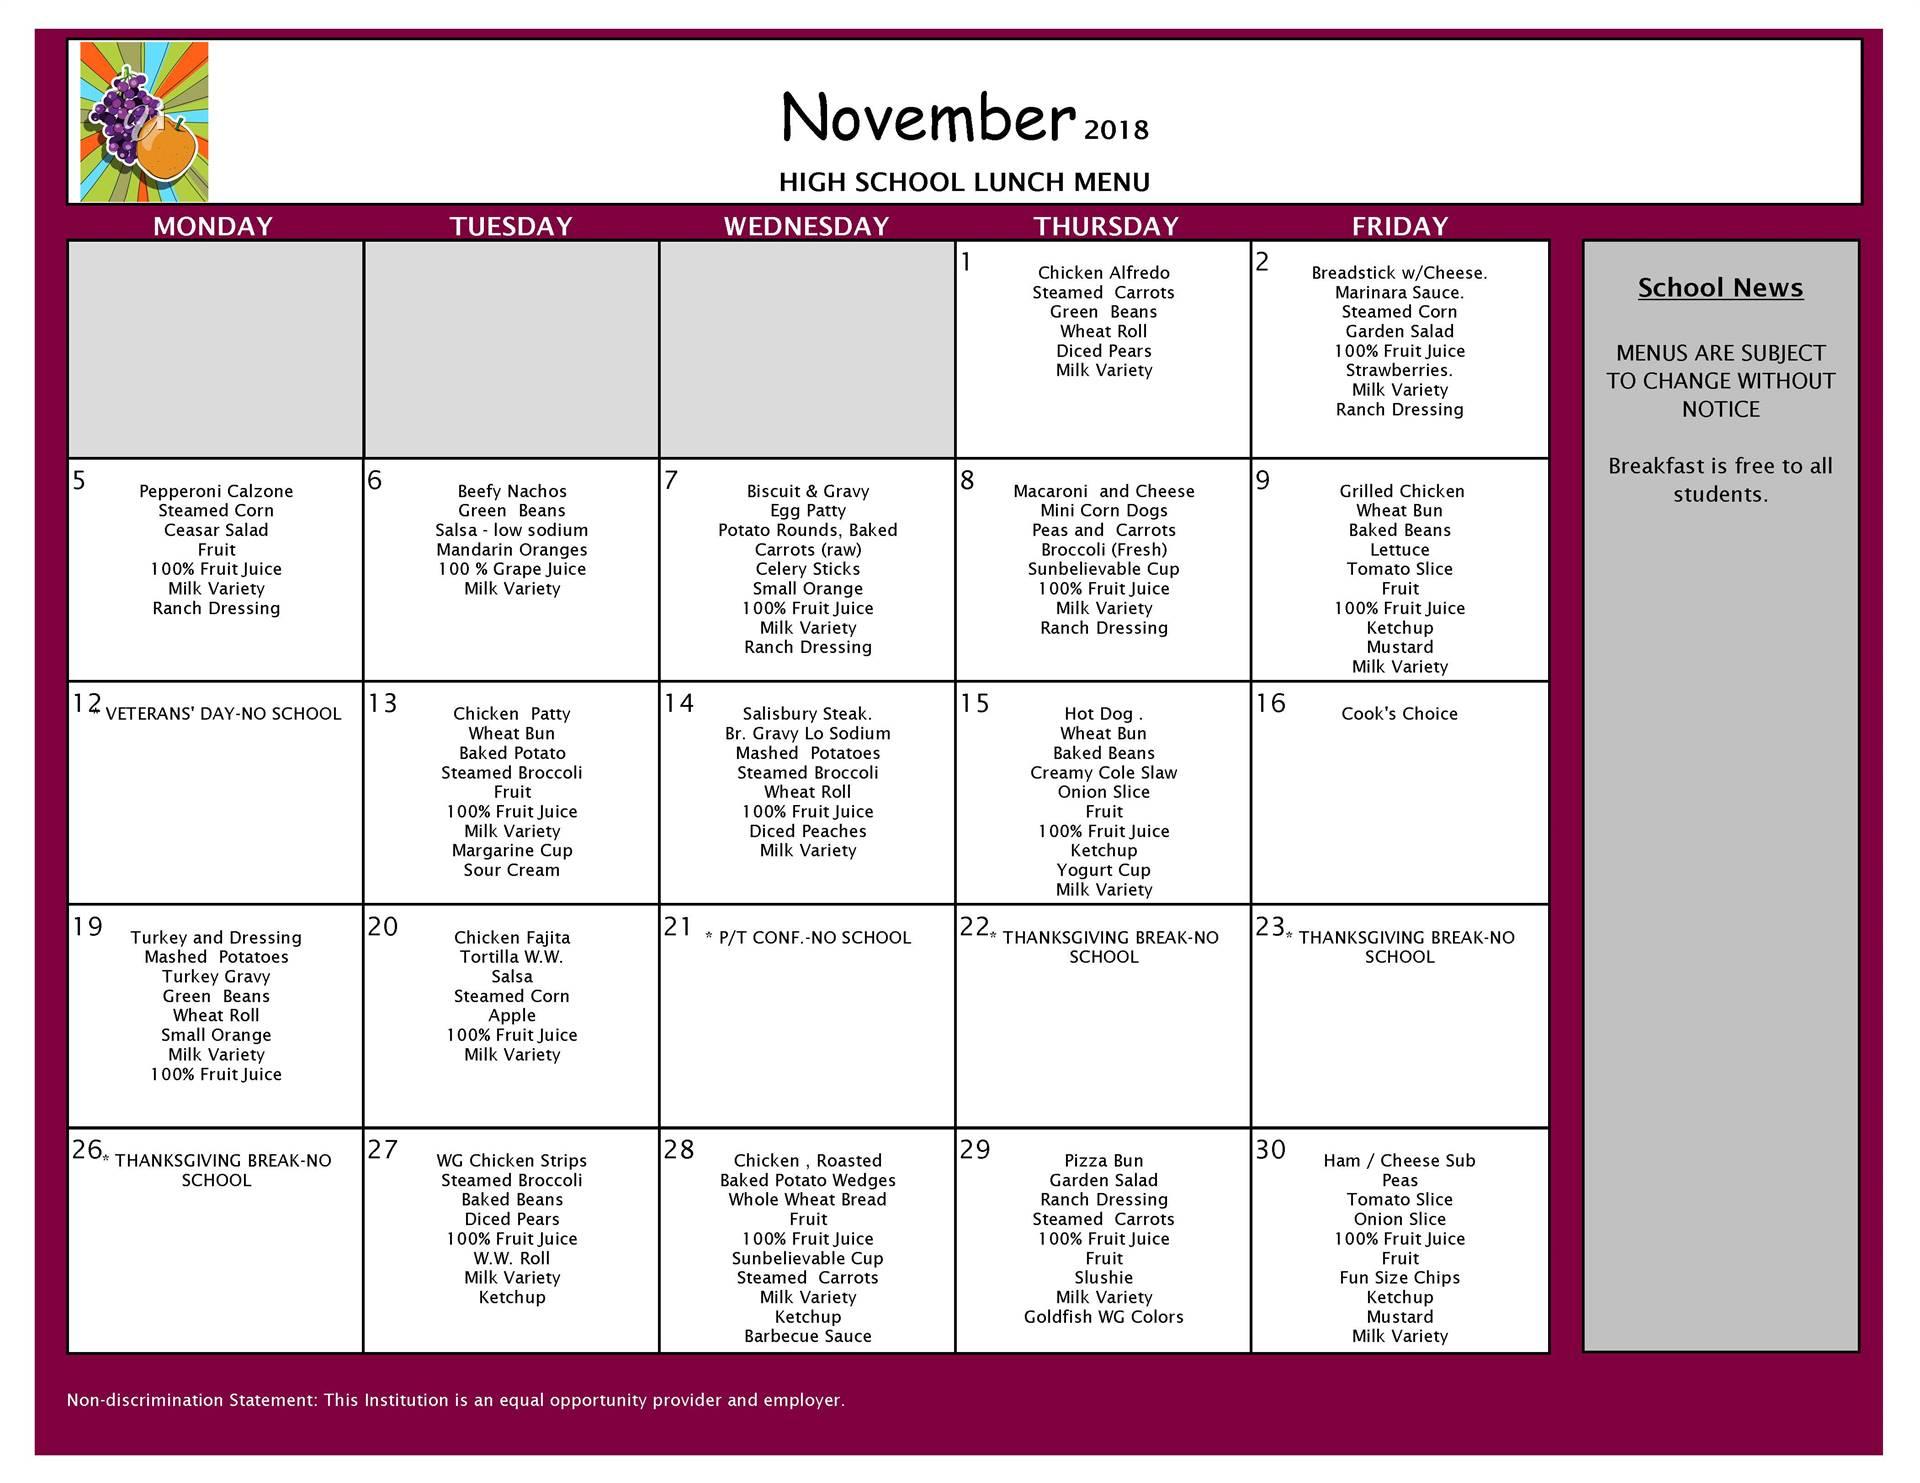 November Lunch Menu High School